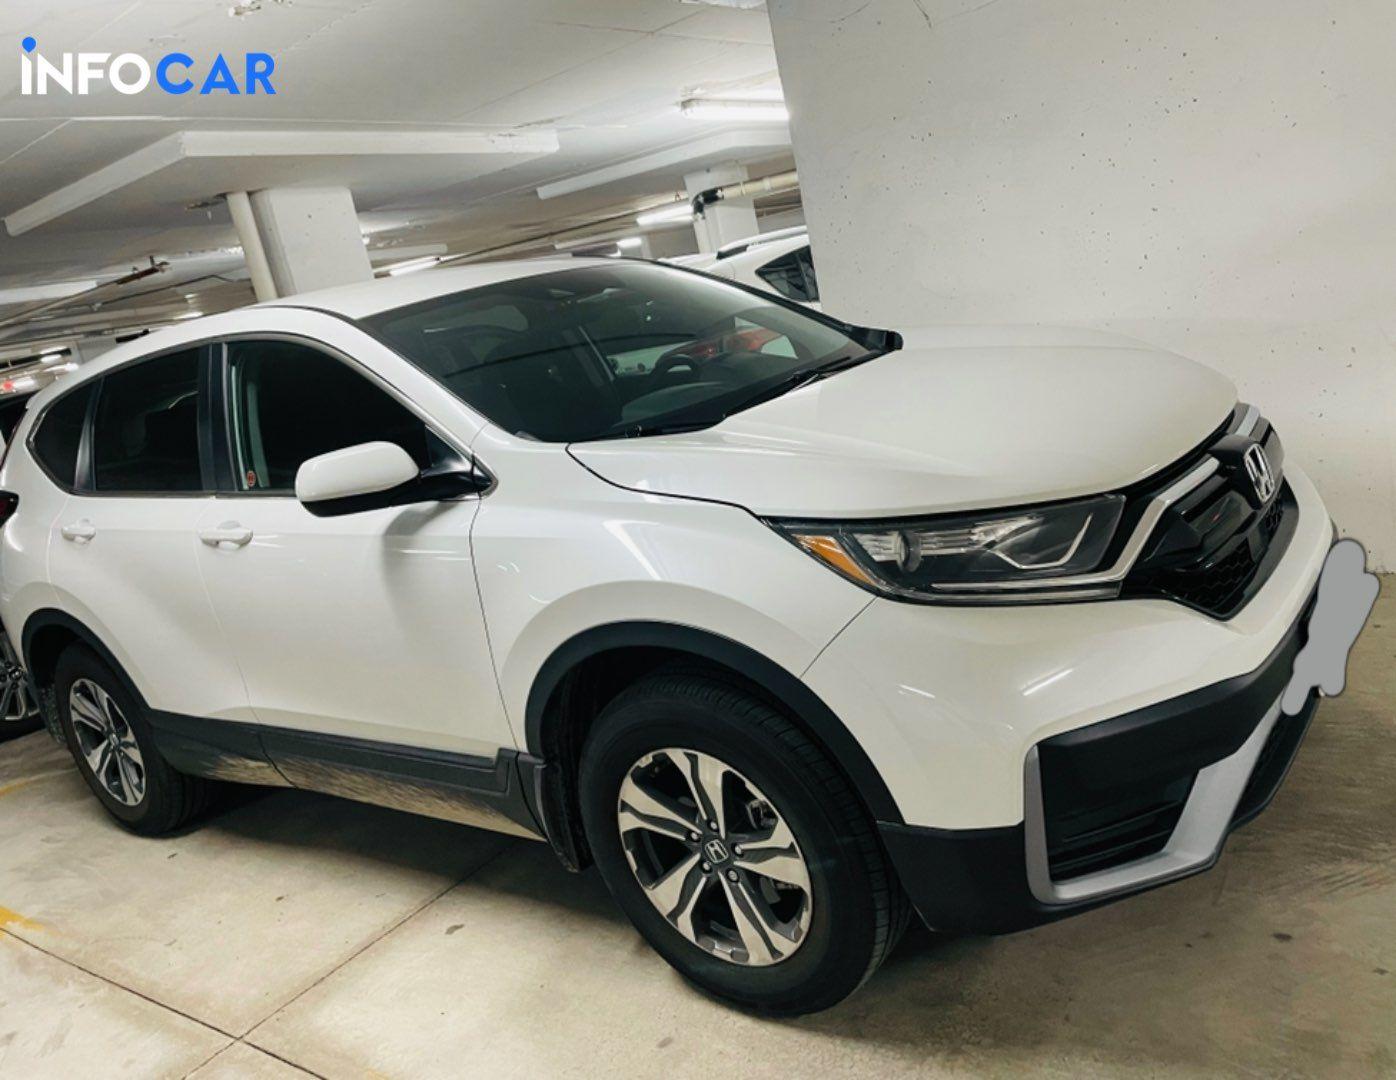 2021 Honda CR-V LX - INFOCAR - Toronto's Most Comprehensive New and Used Auto Trading Platform